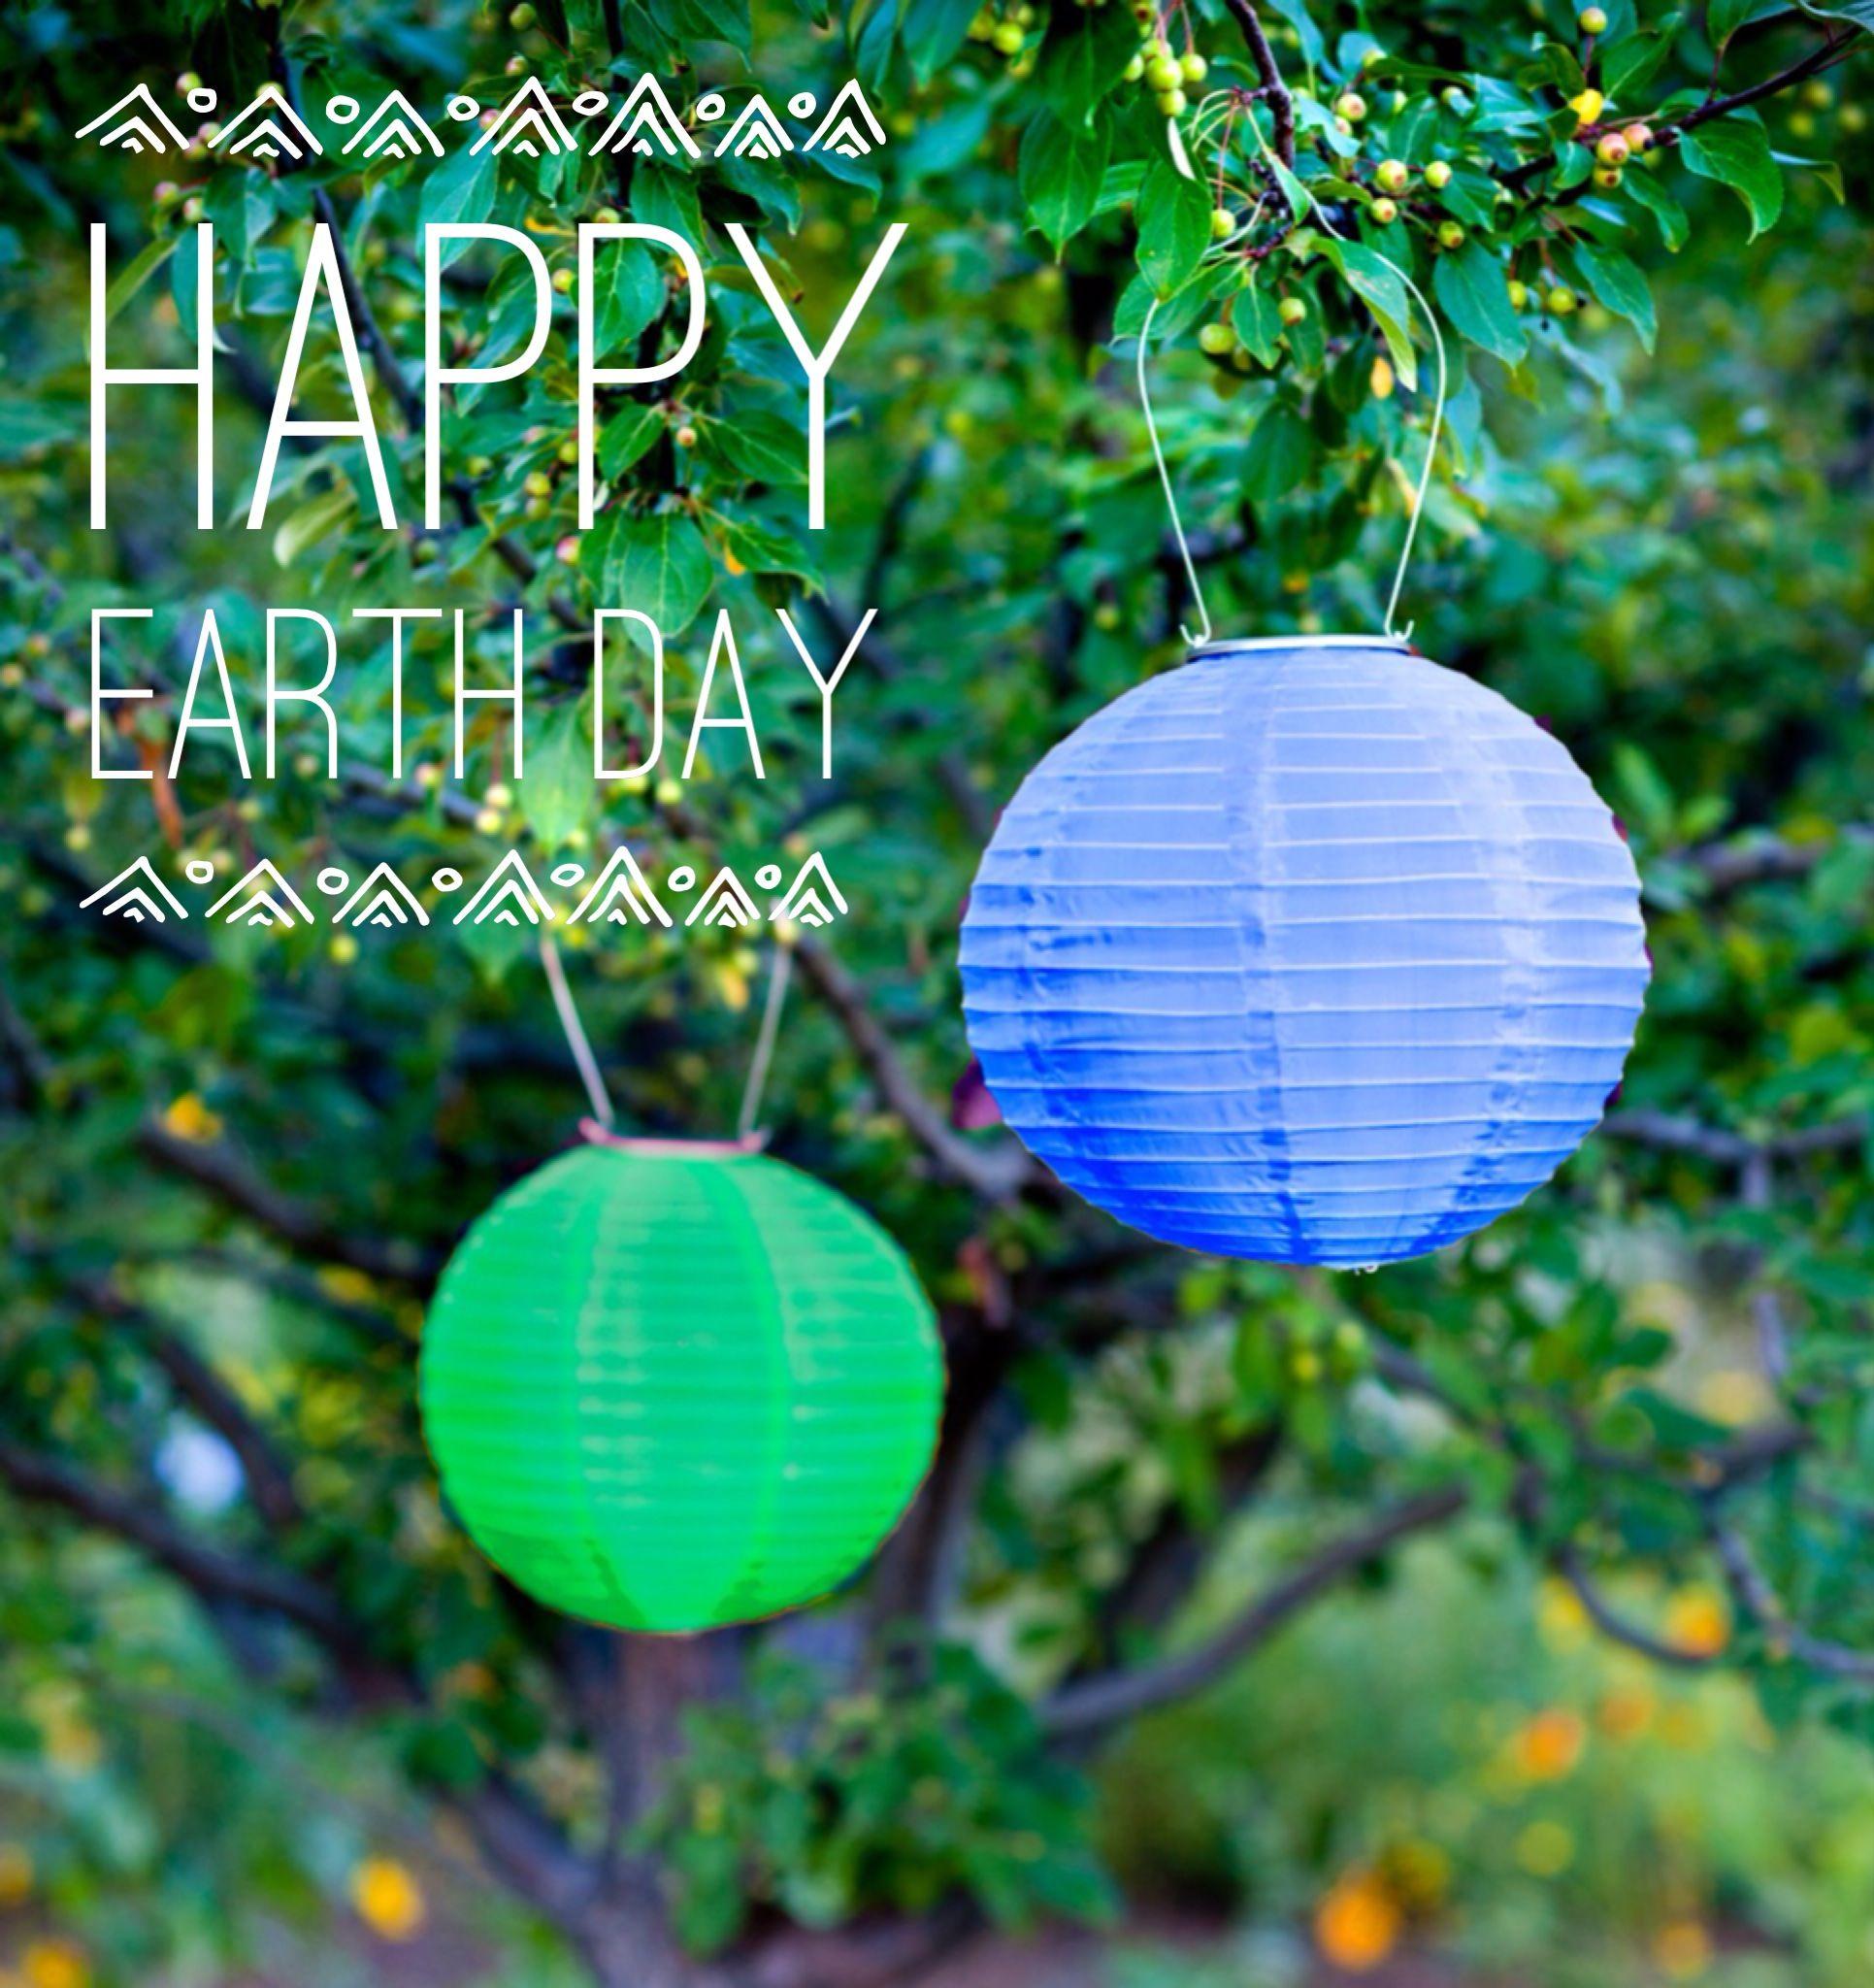 Soji Solar Lanterns In Blue And Green! Www.allsopgarden.com   Happy Earth